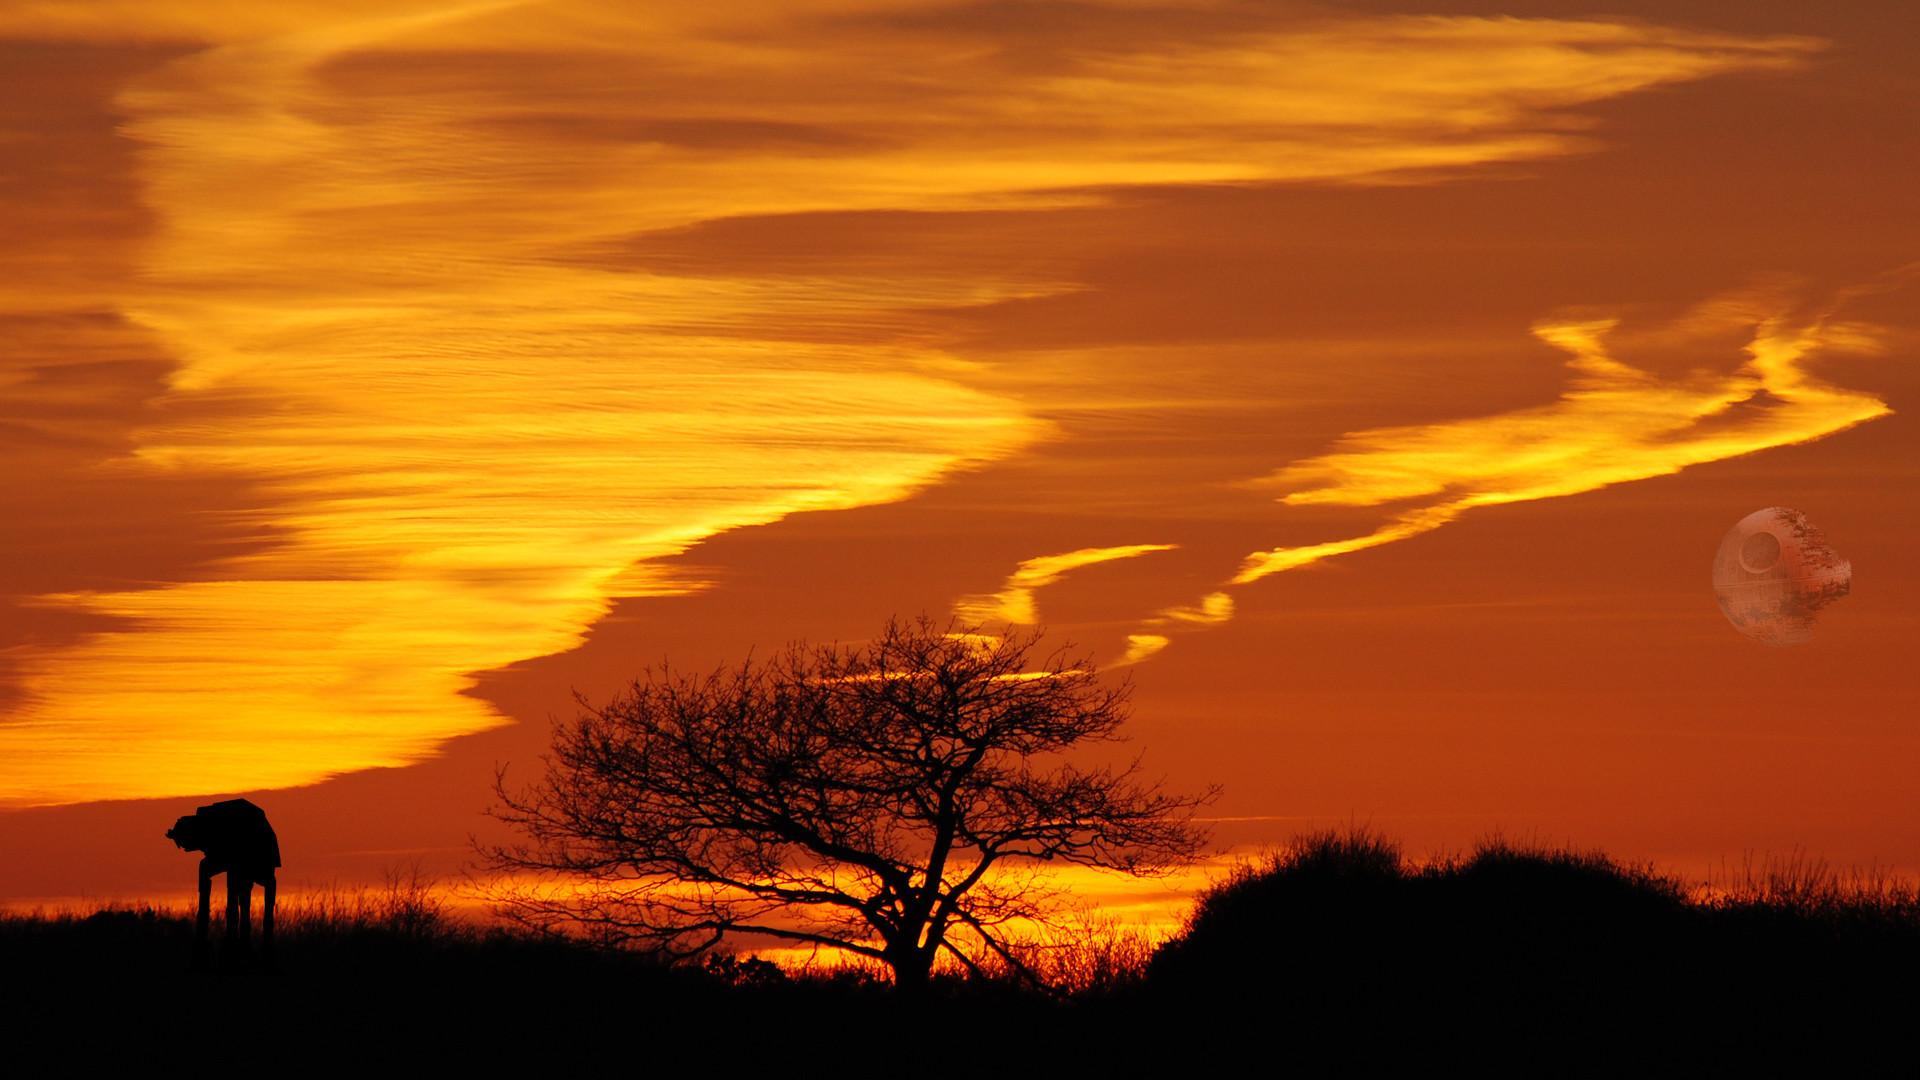 Landscape Nature Star Wars Sunset Tree